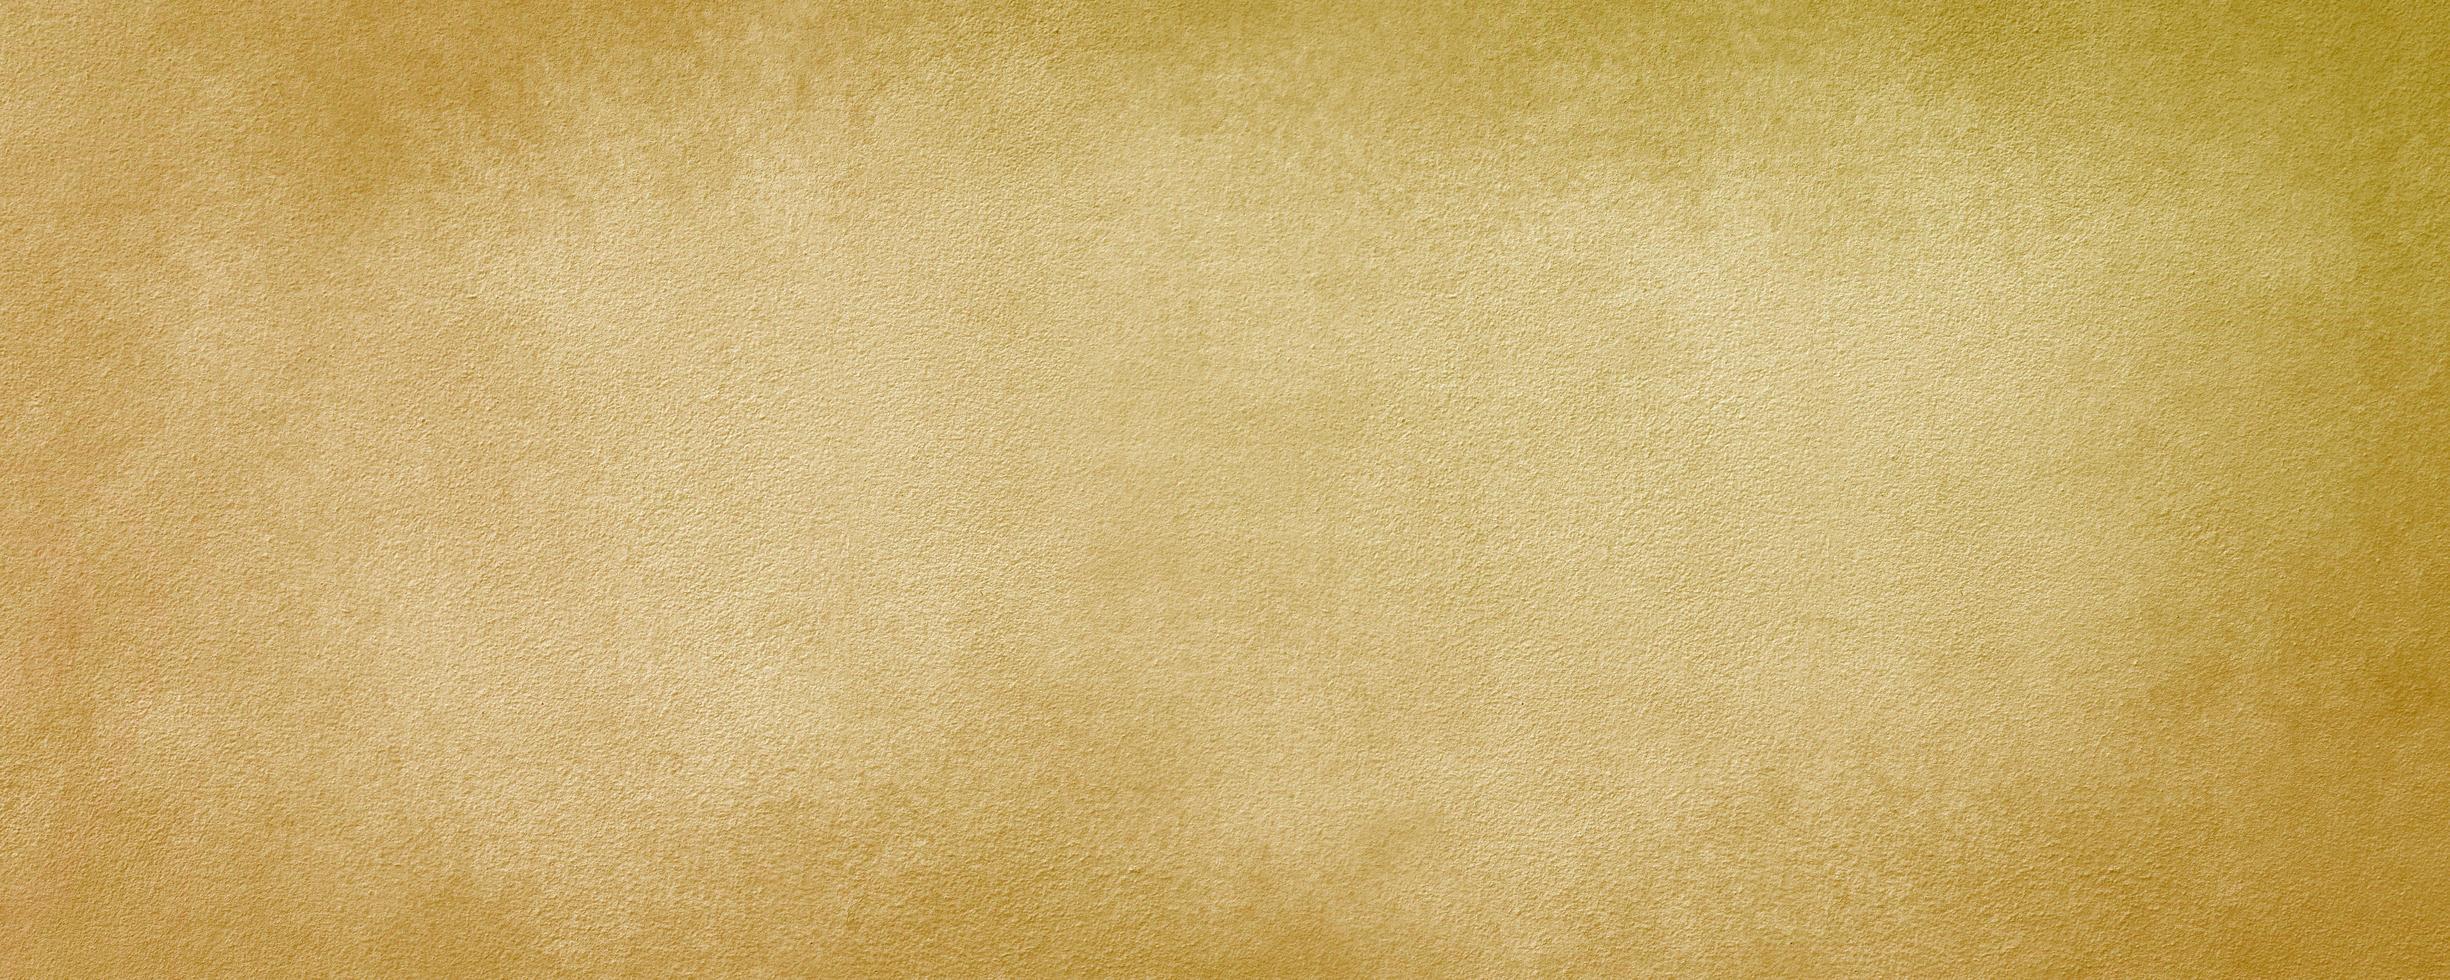 abstracte vintage gele cement muur achtergrond met gekrast, modern beton als achtergrond met ruwe textuur, schoolbord. concrete kunst ruwe gestileerde textuur foto